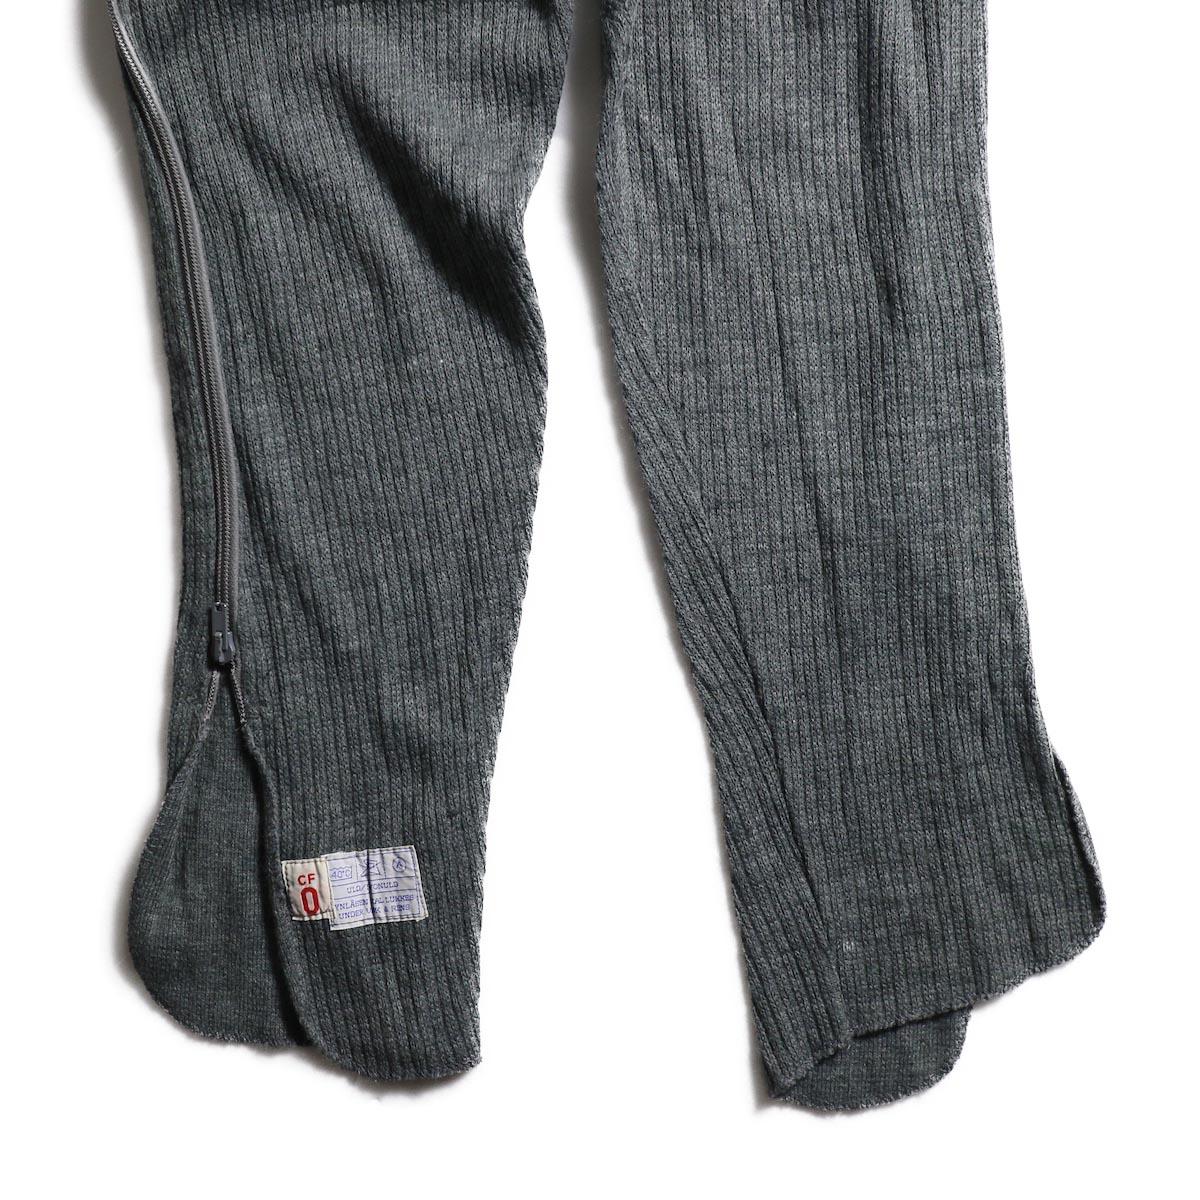 Denmark Military / Side Zip Under Pants (Small) E